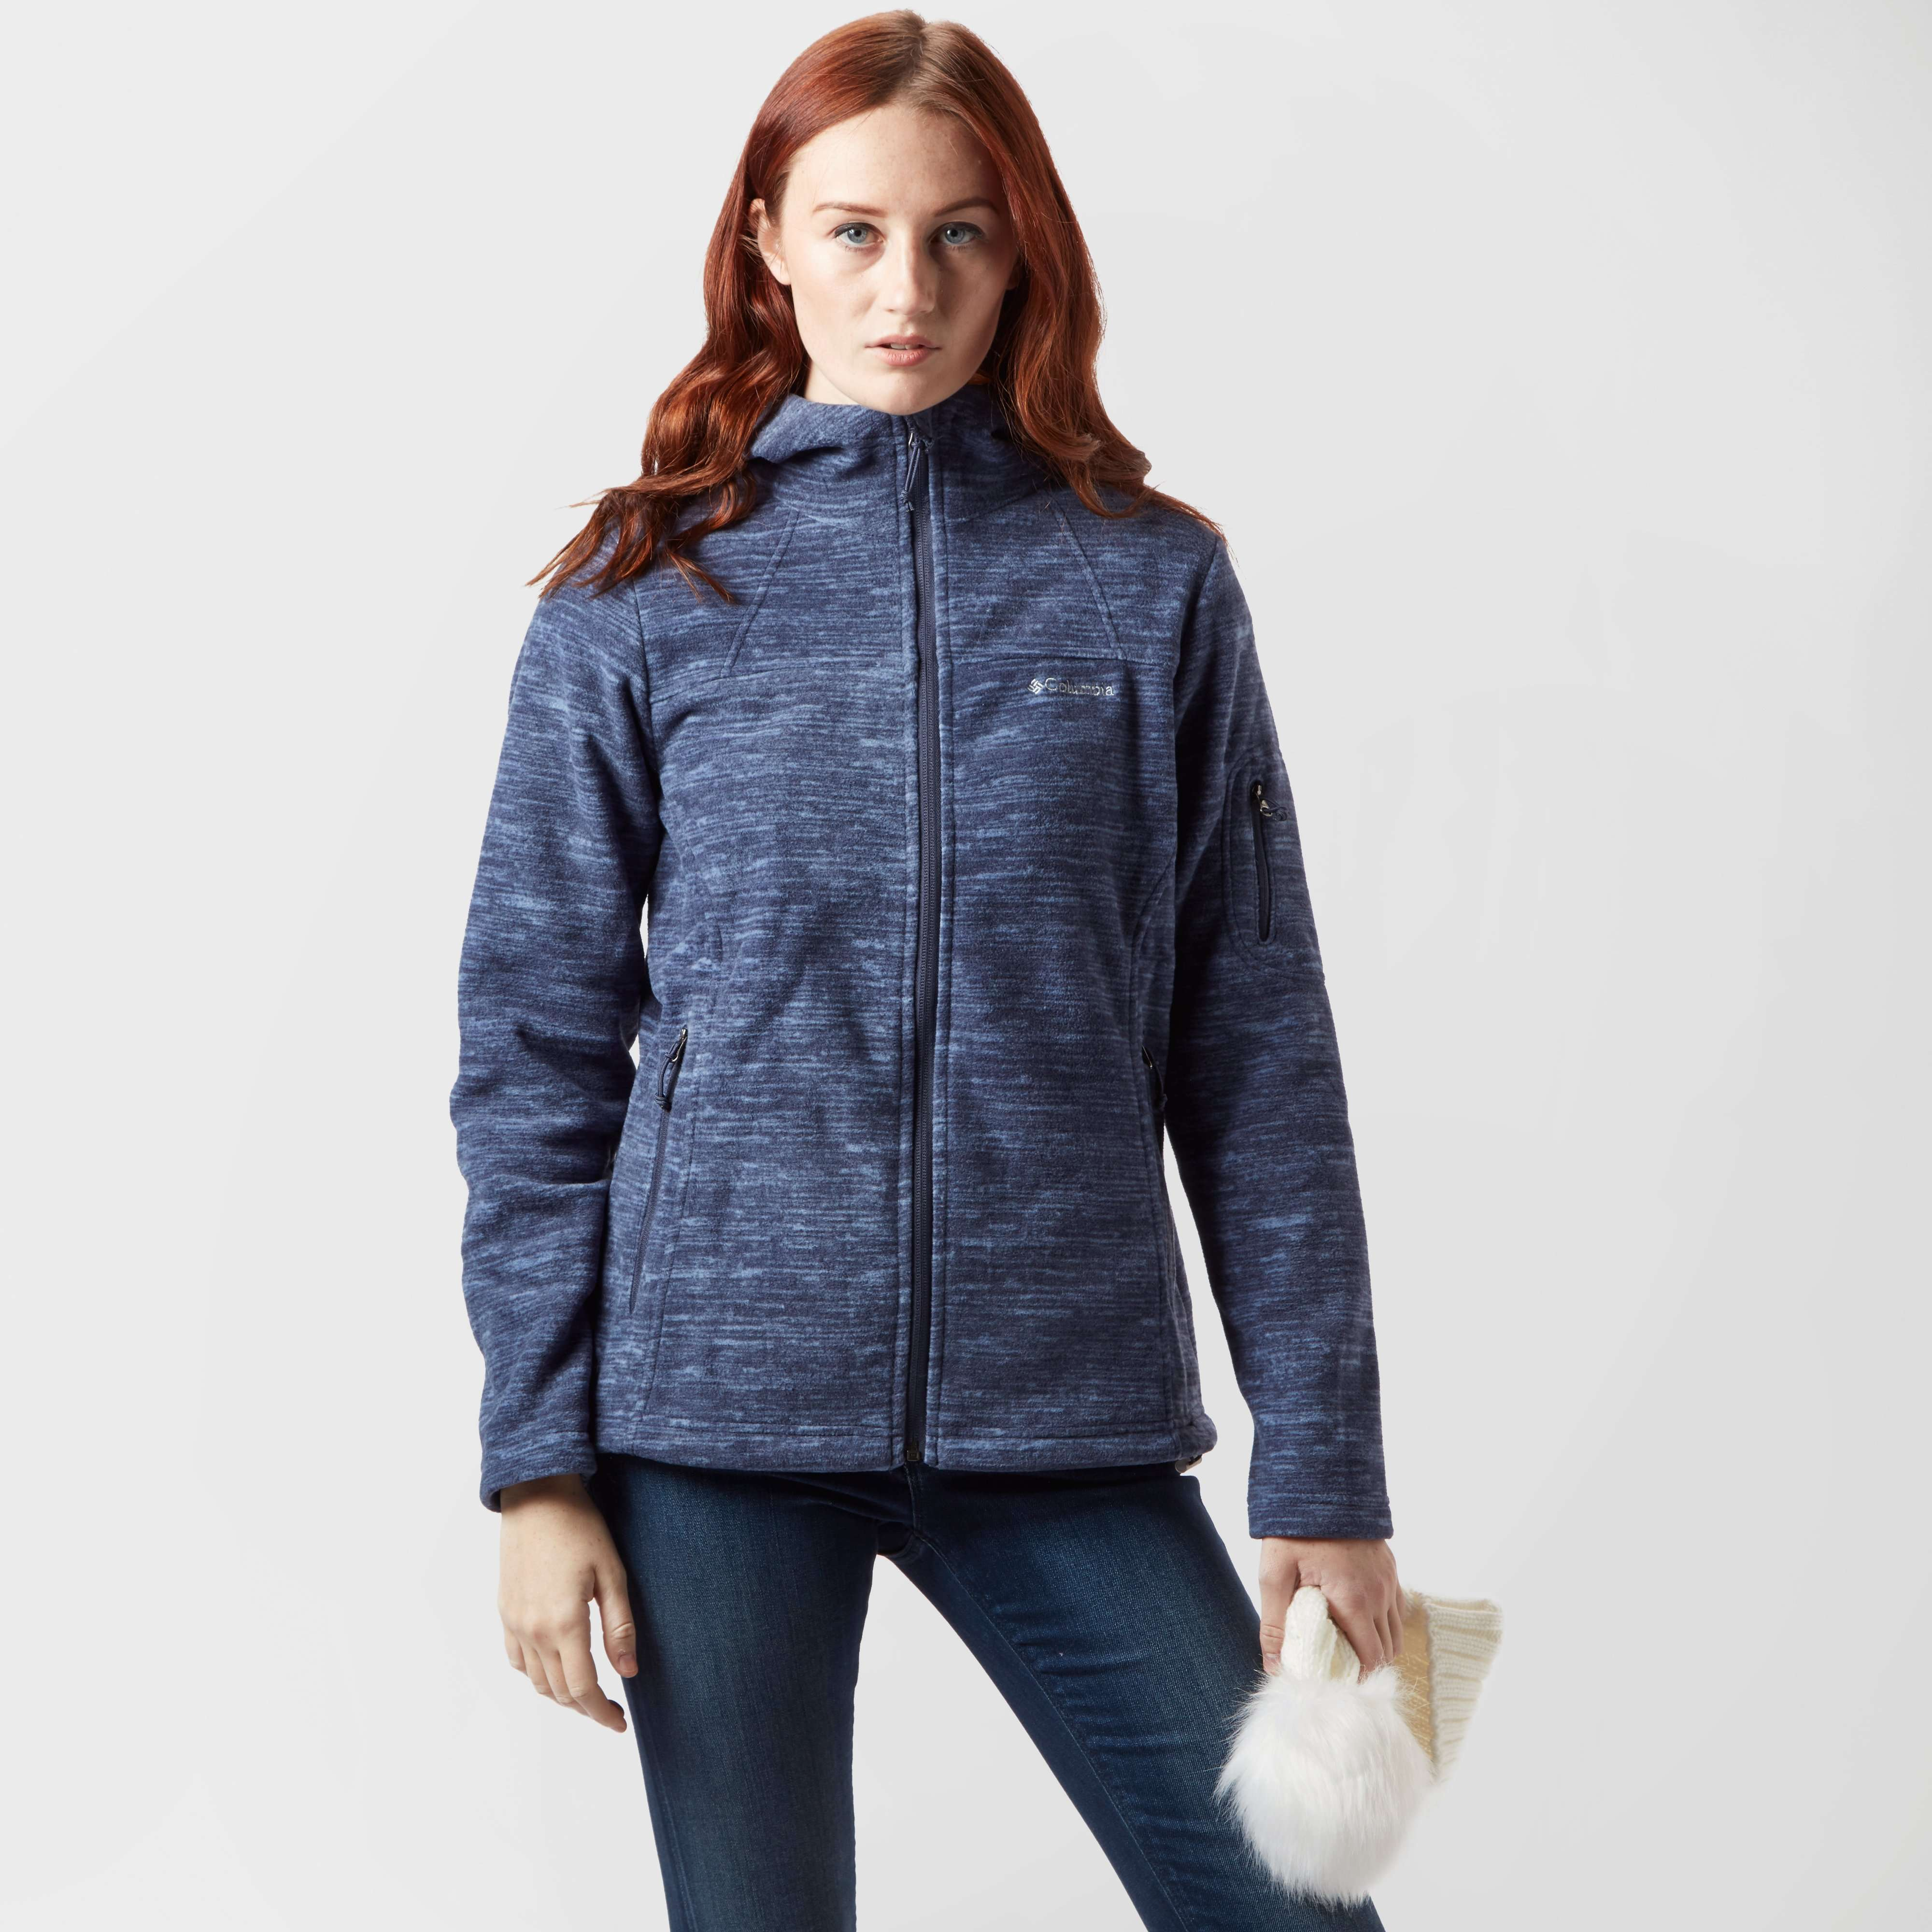 COLUMBIA Women's Fast Trek Hooded Jacket